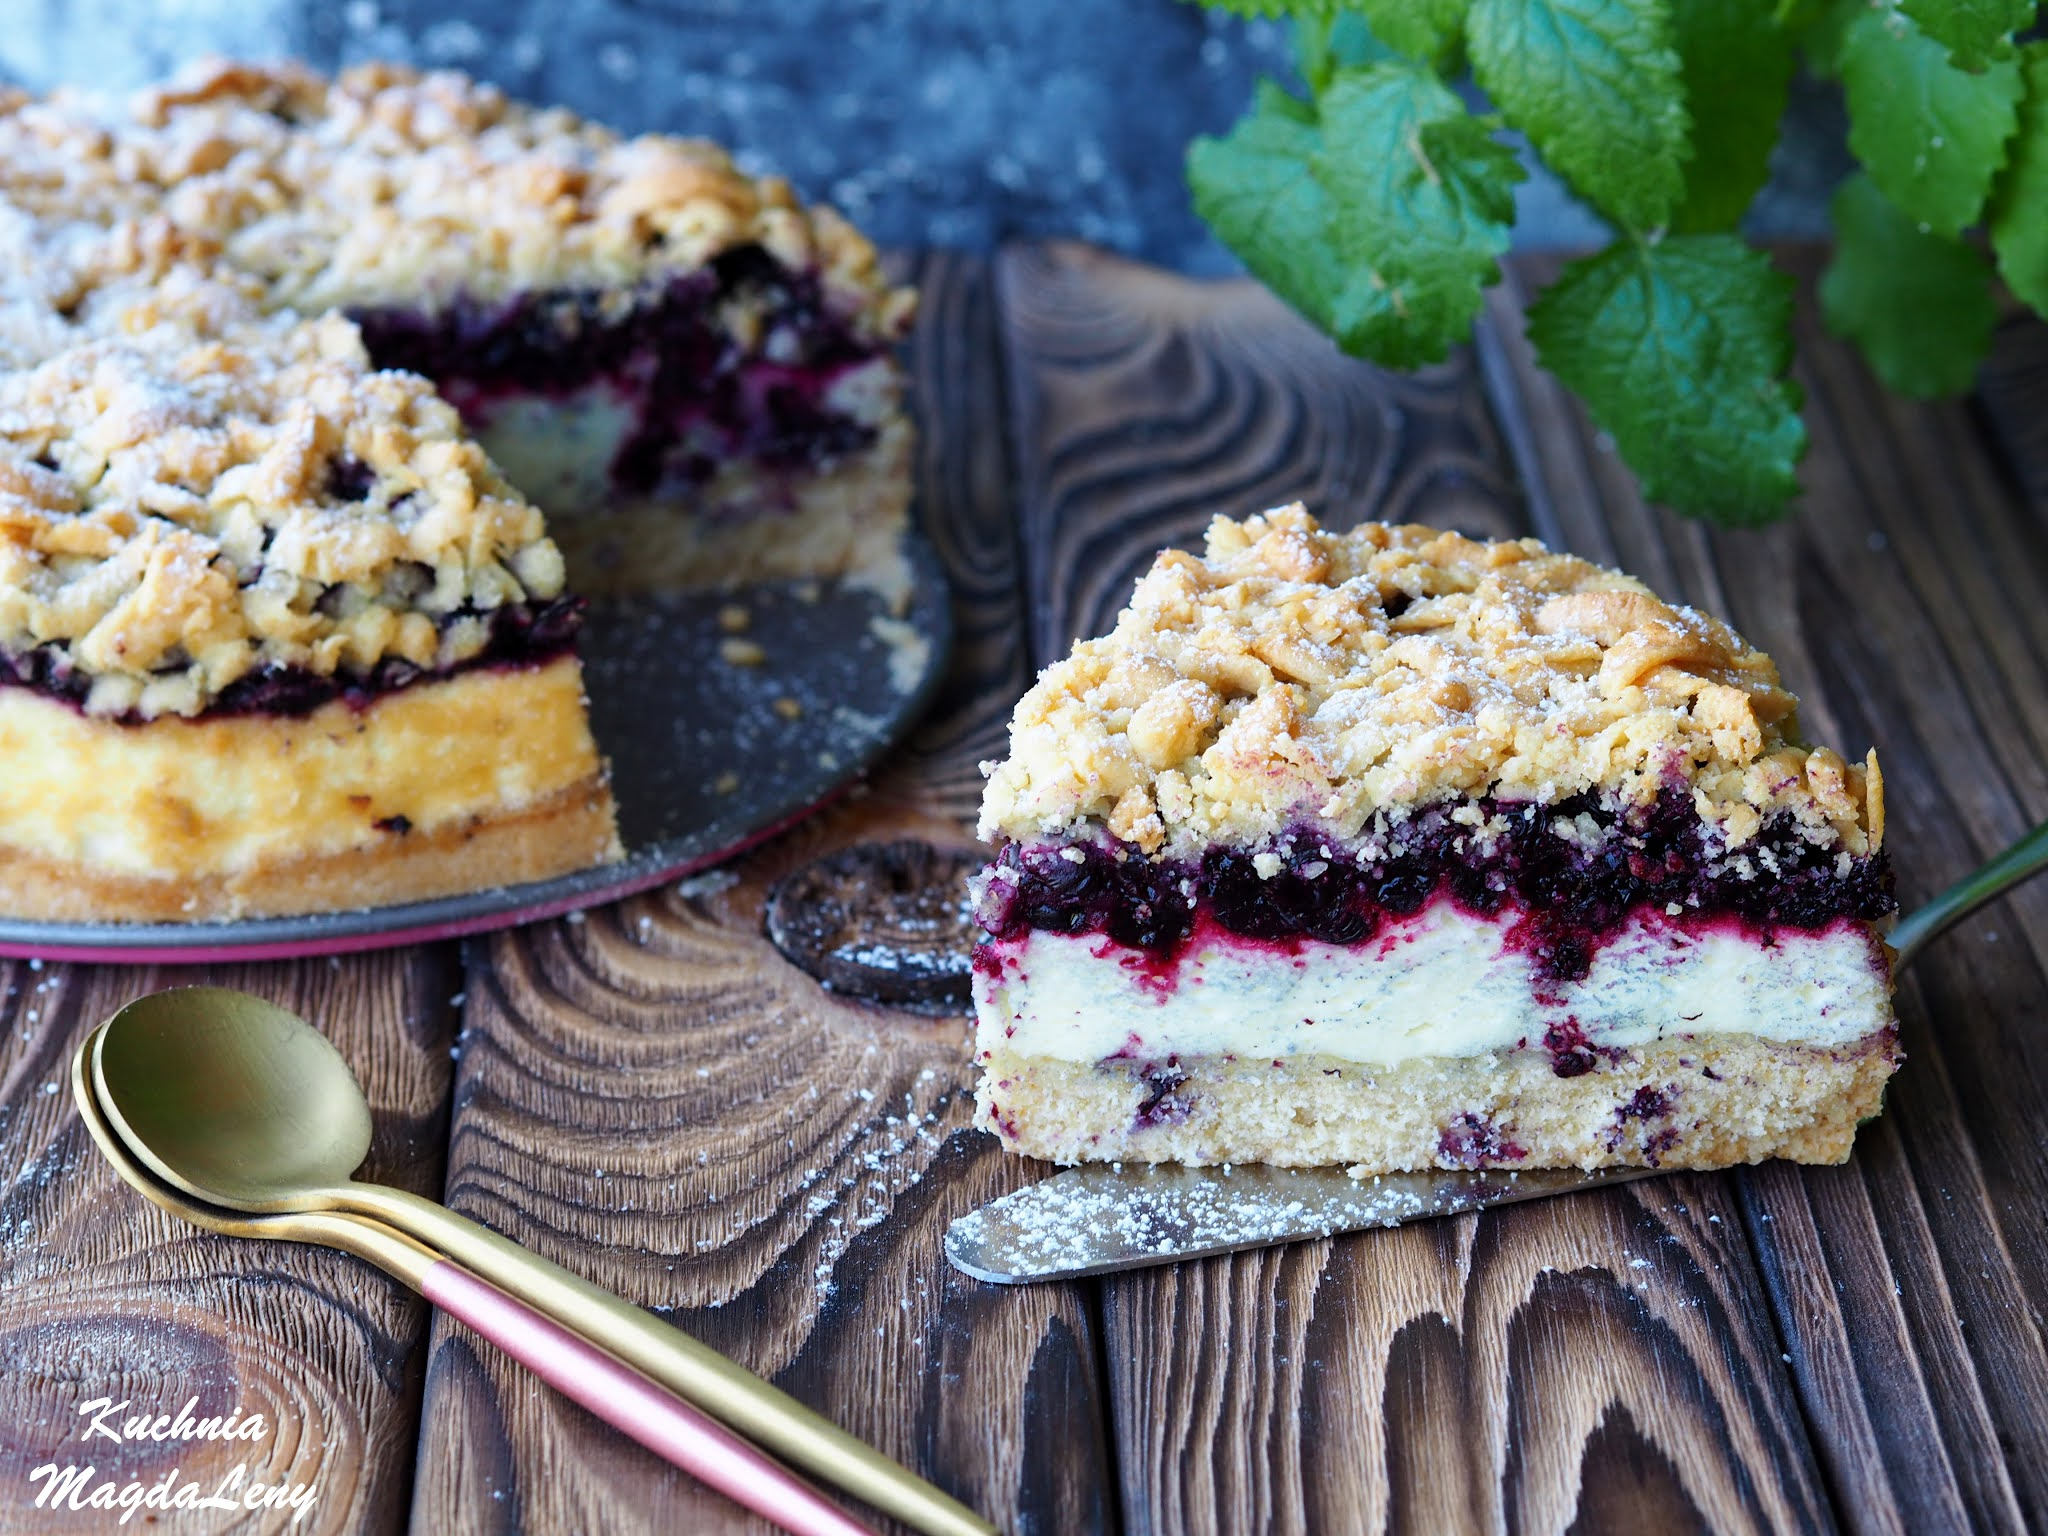 Ciasto kruche z pianką budyniową i jagodami